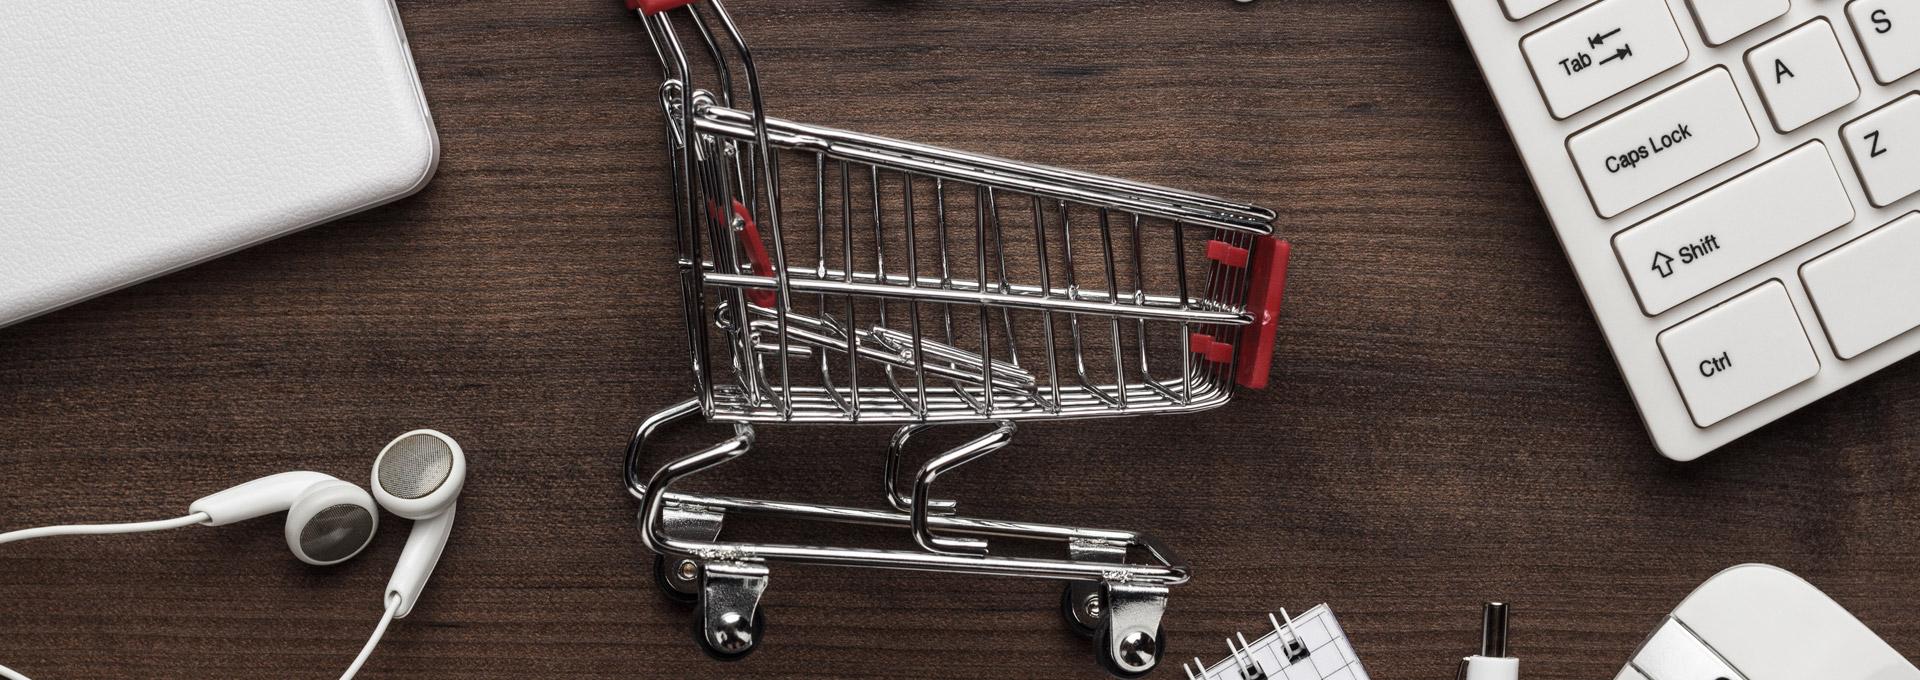 online shop programmieren lassen